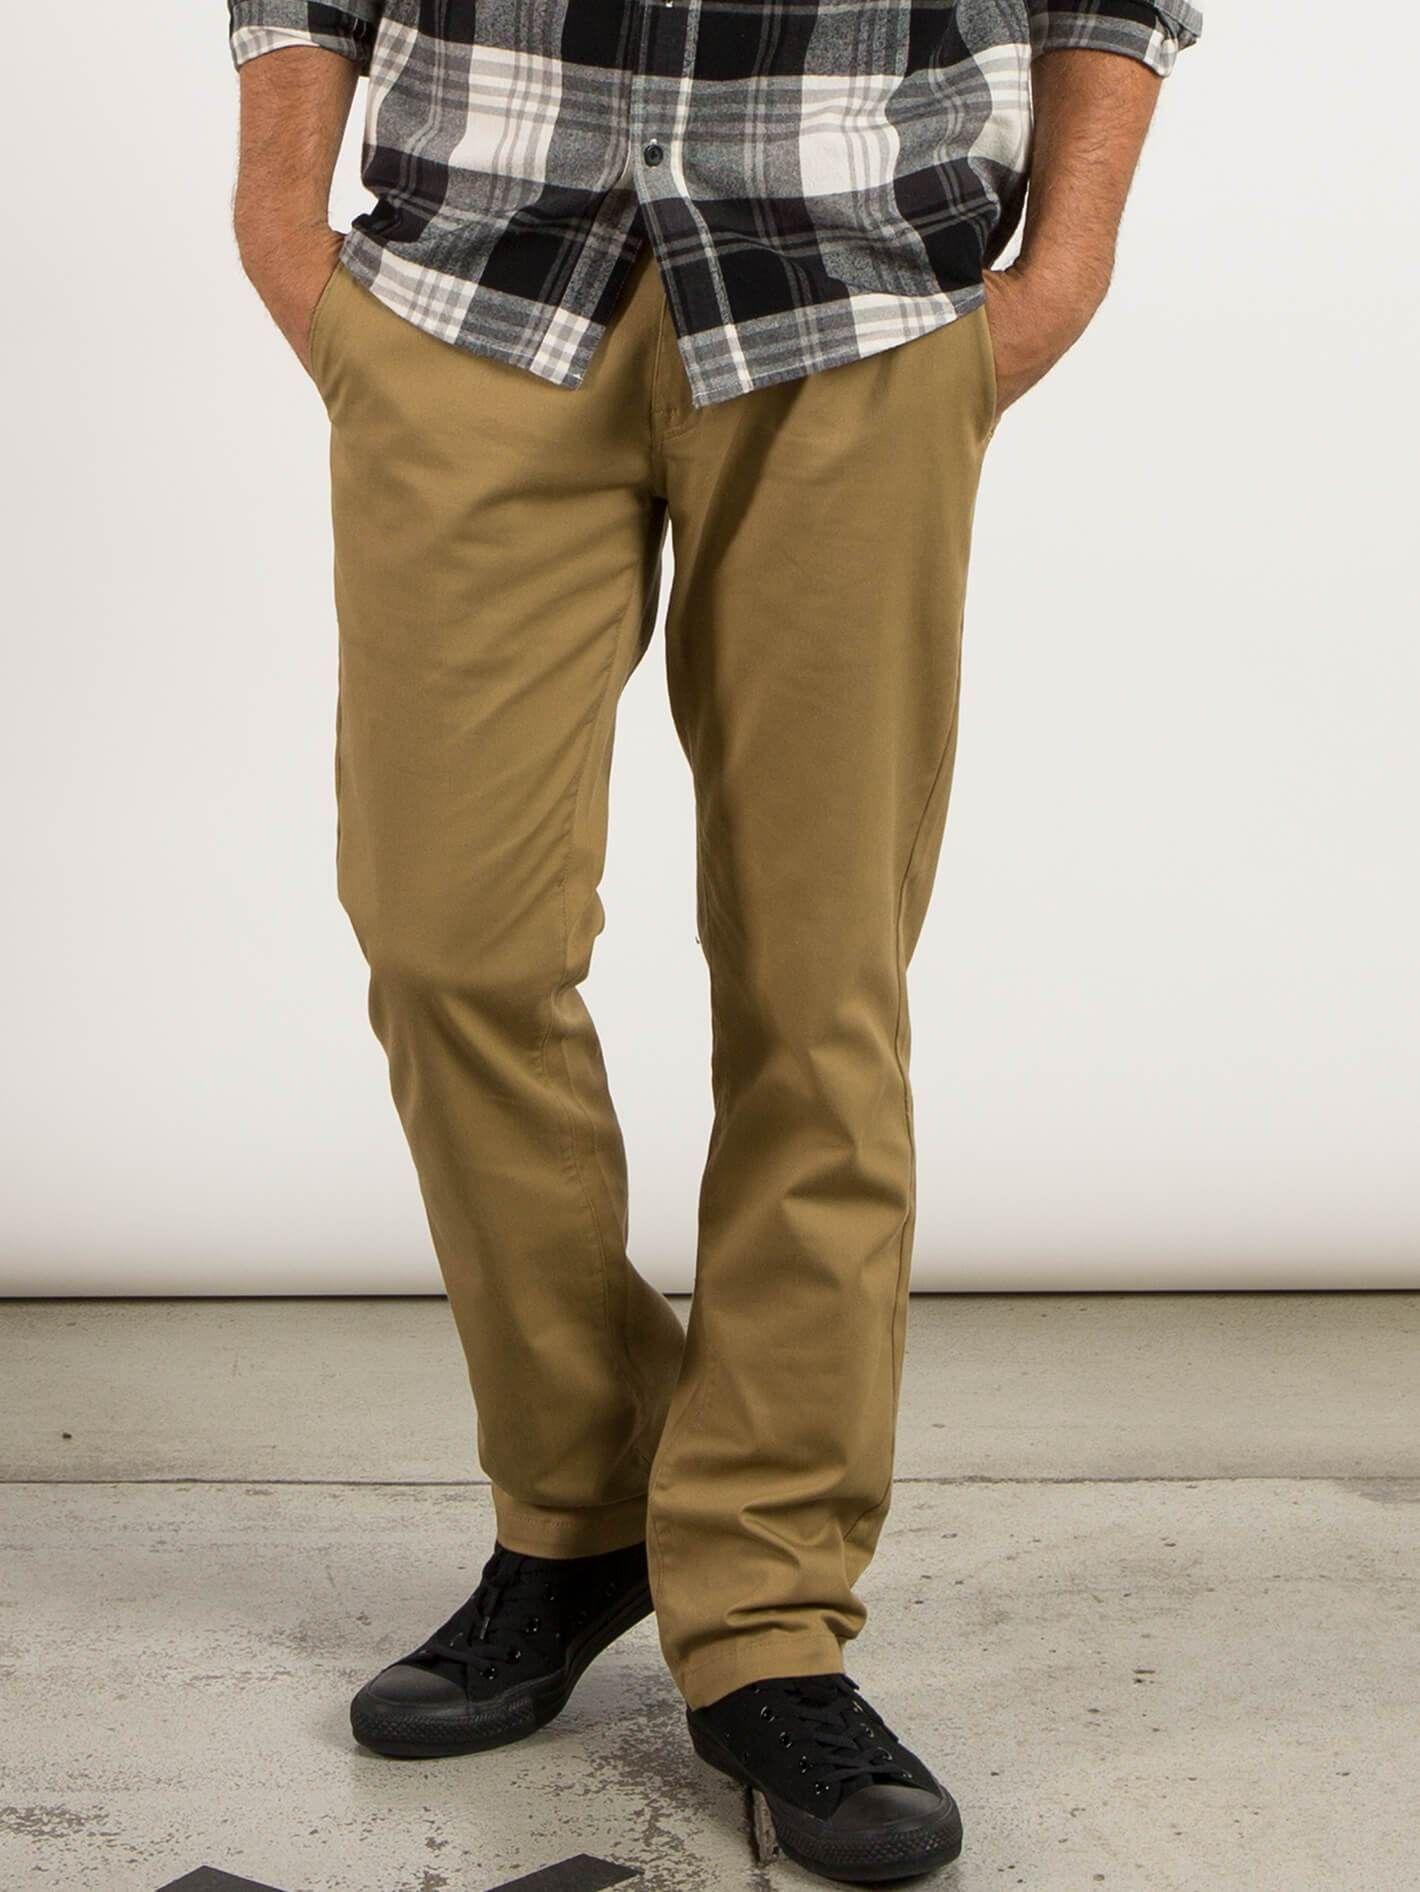 Volcom Men/'s Frickin Modern Stretch Chino Pants Dk Khaki Brown Clothing Apparel